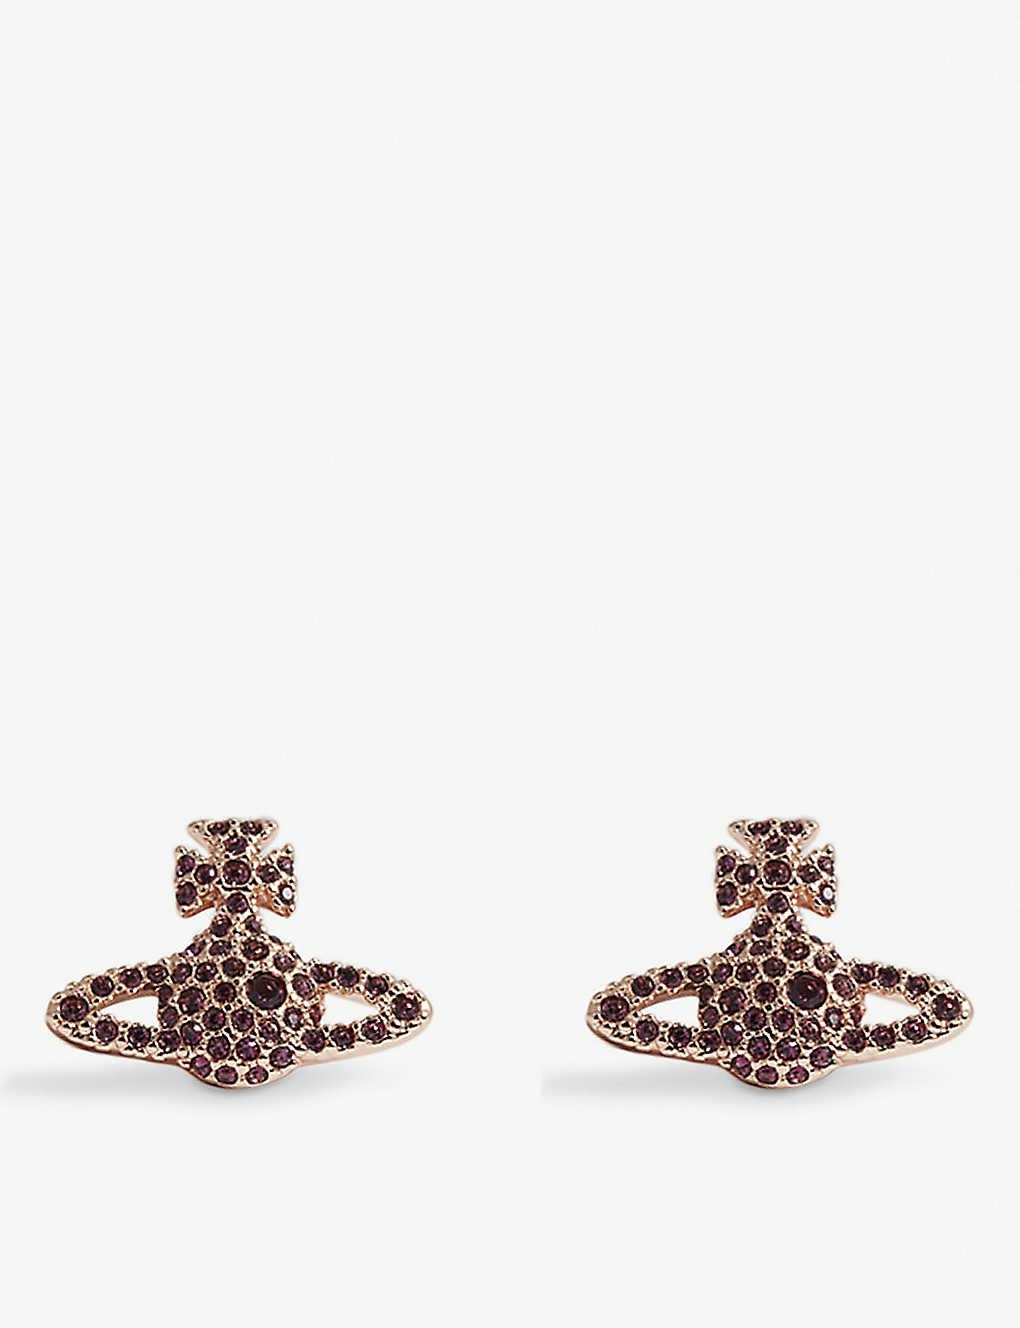 fe2c5d1b9 VIVIENNE WESTWOOD JEWELLERY Grace Bas Relief pavé orb stud earrings